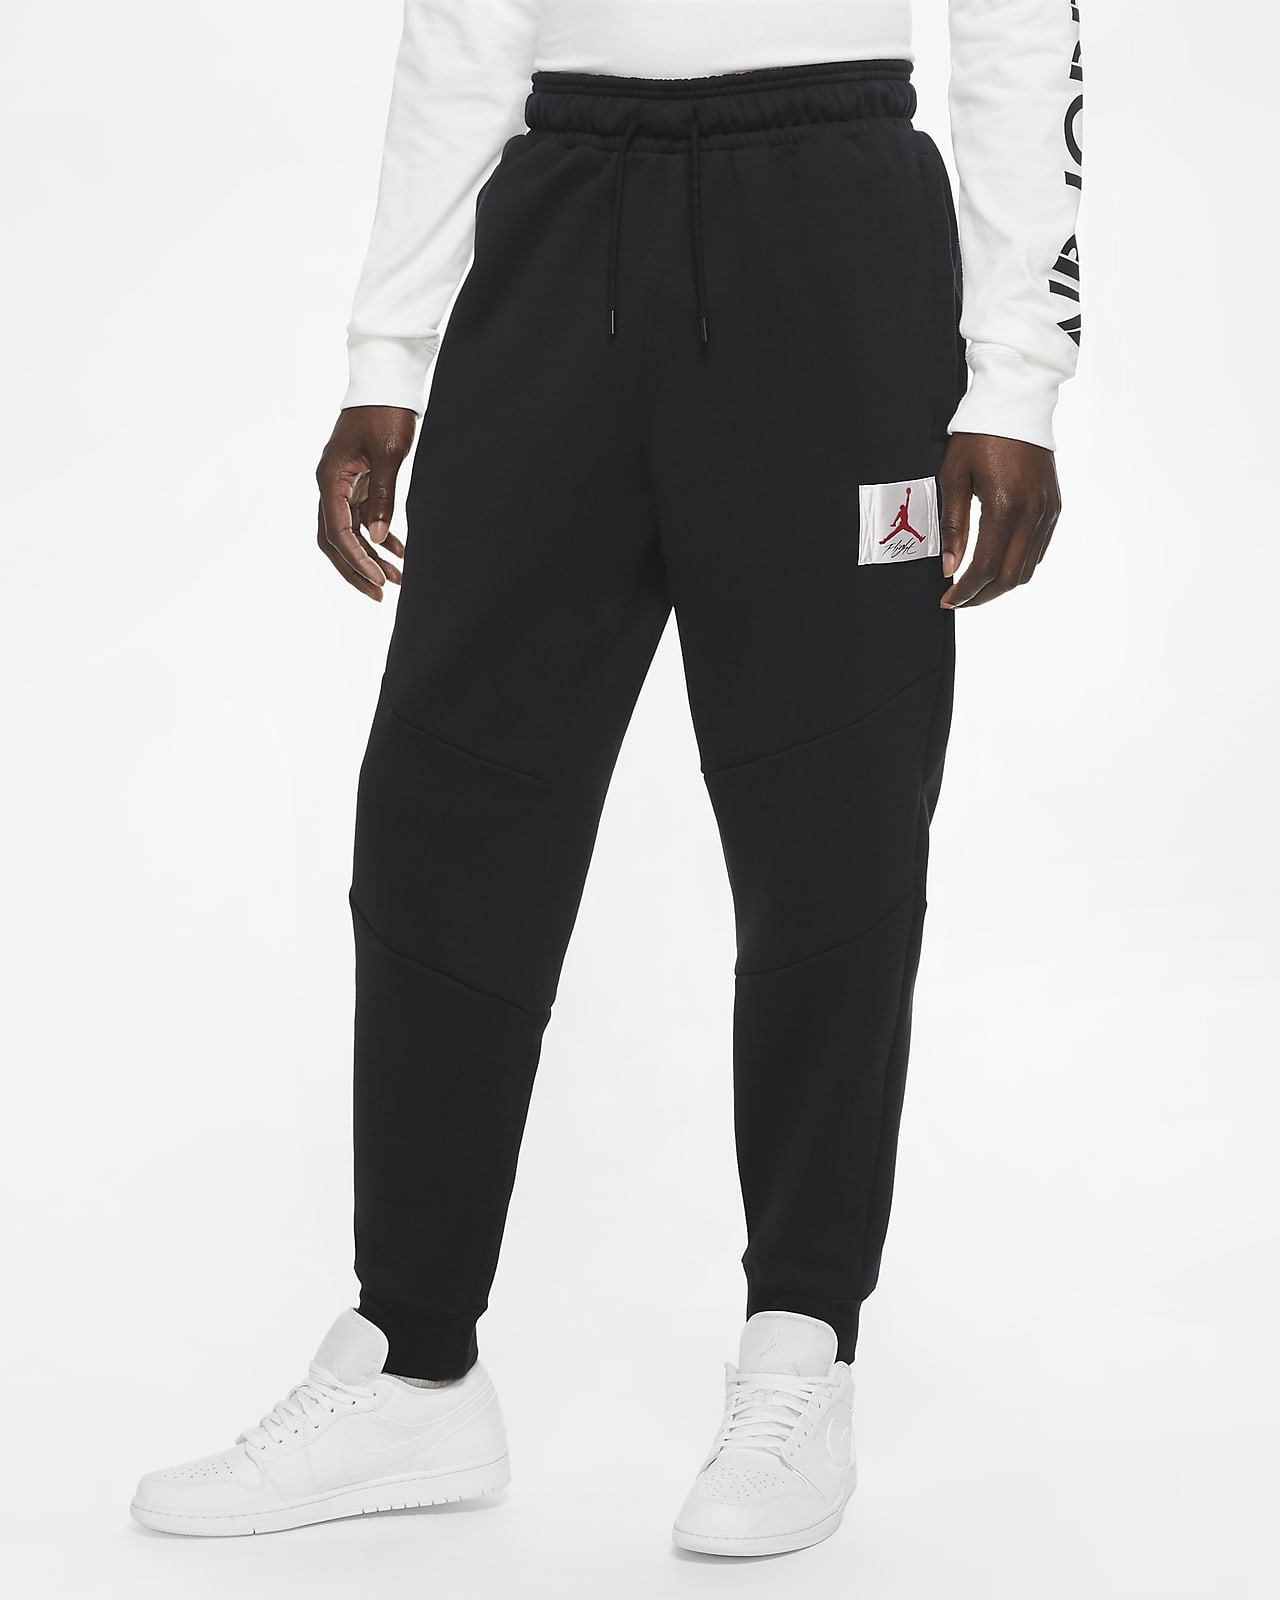 Jordan Flight Men's Fleece Pants